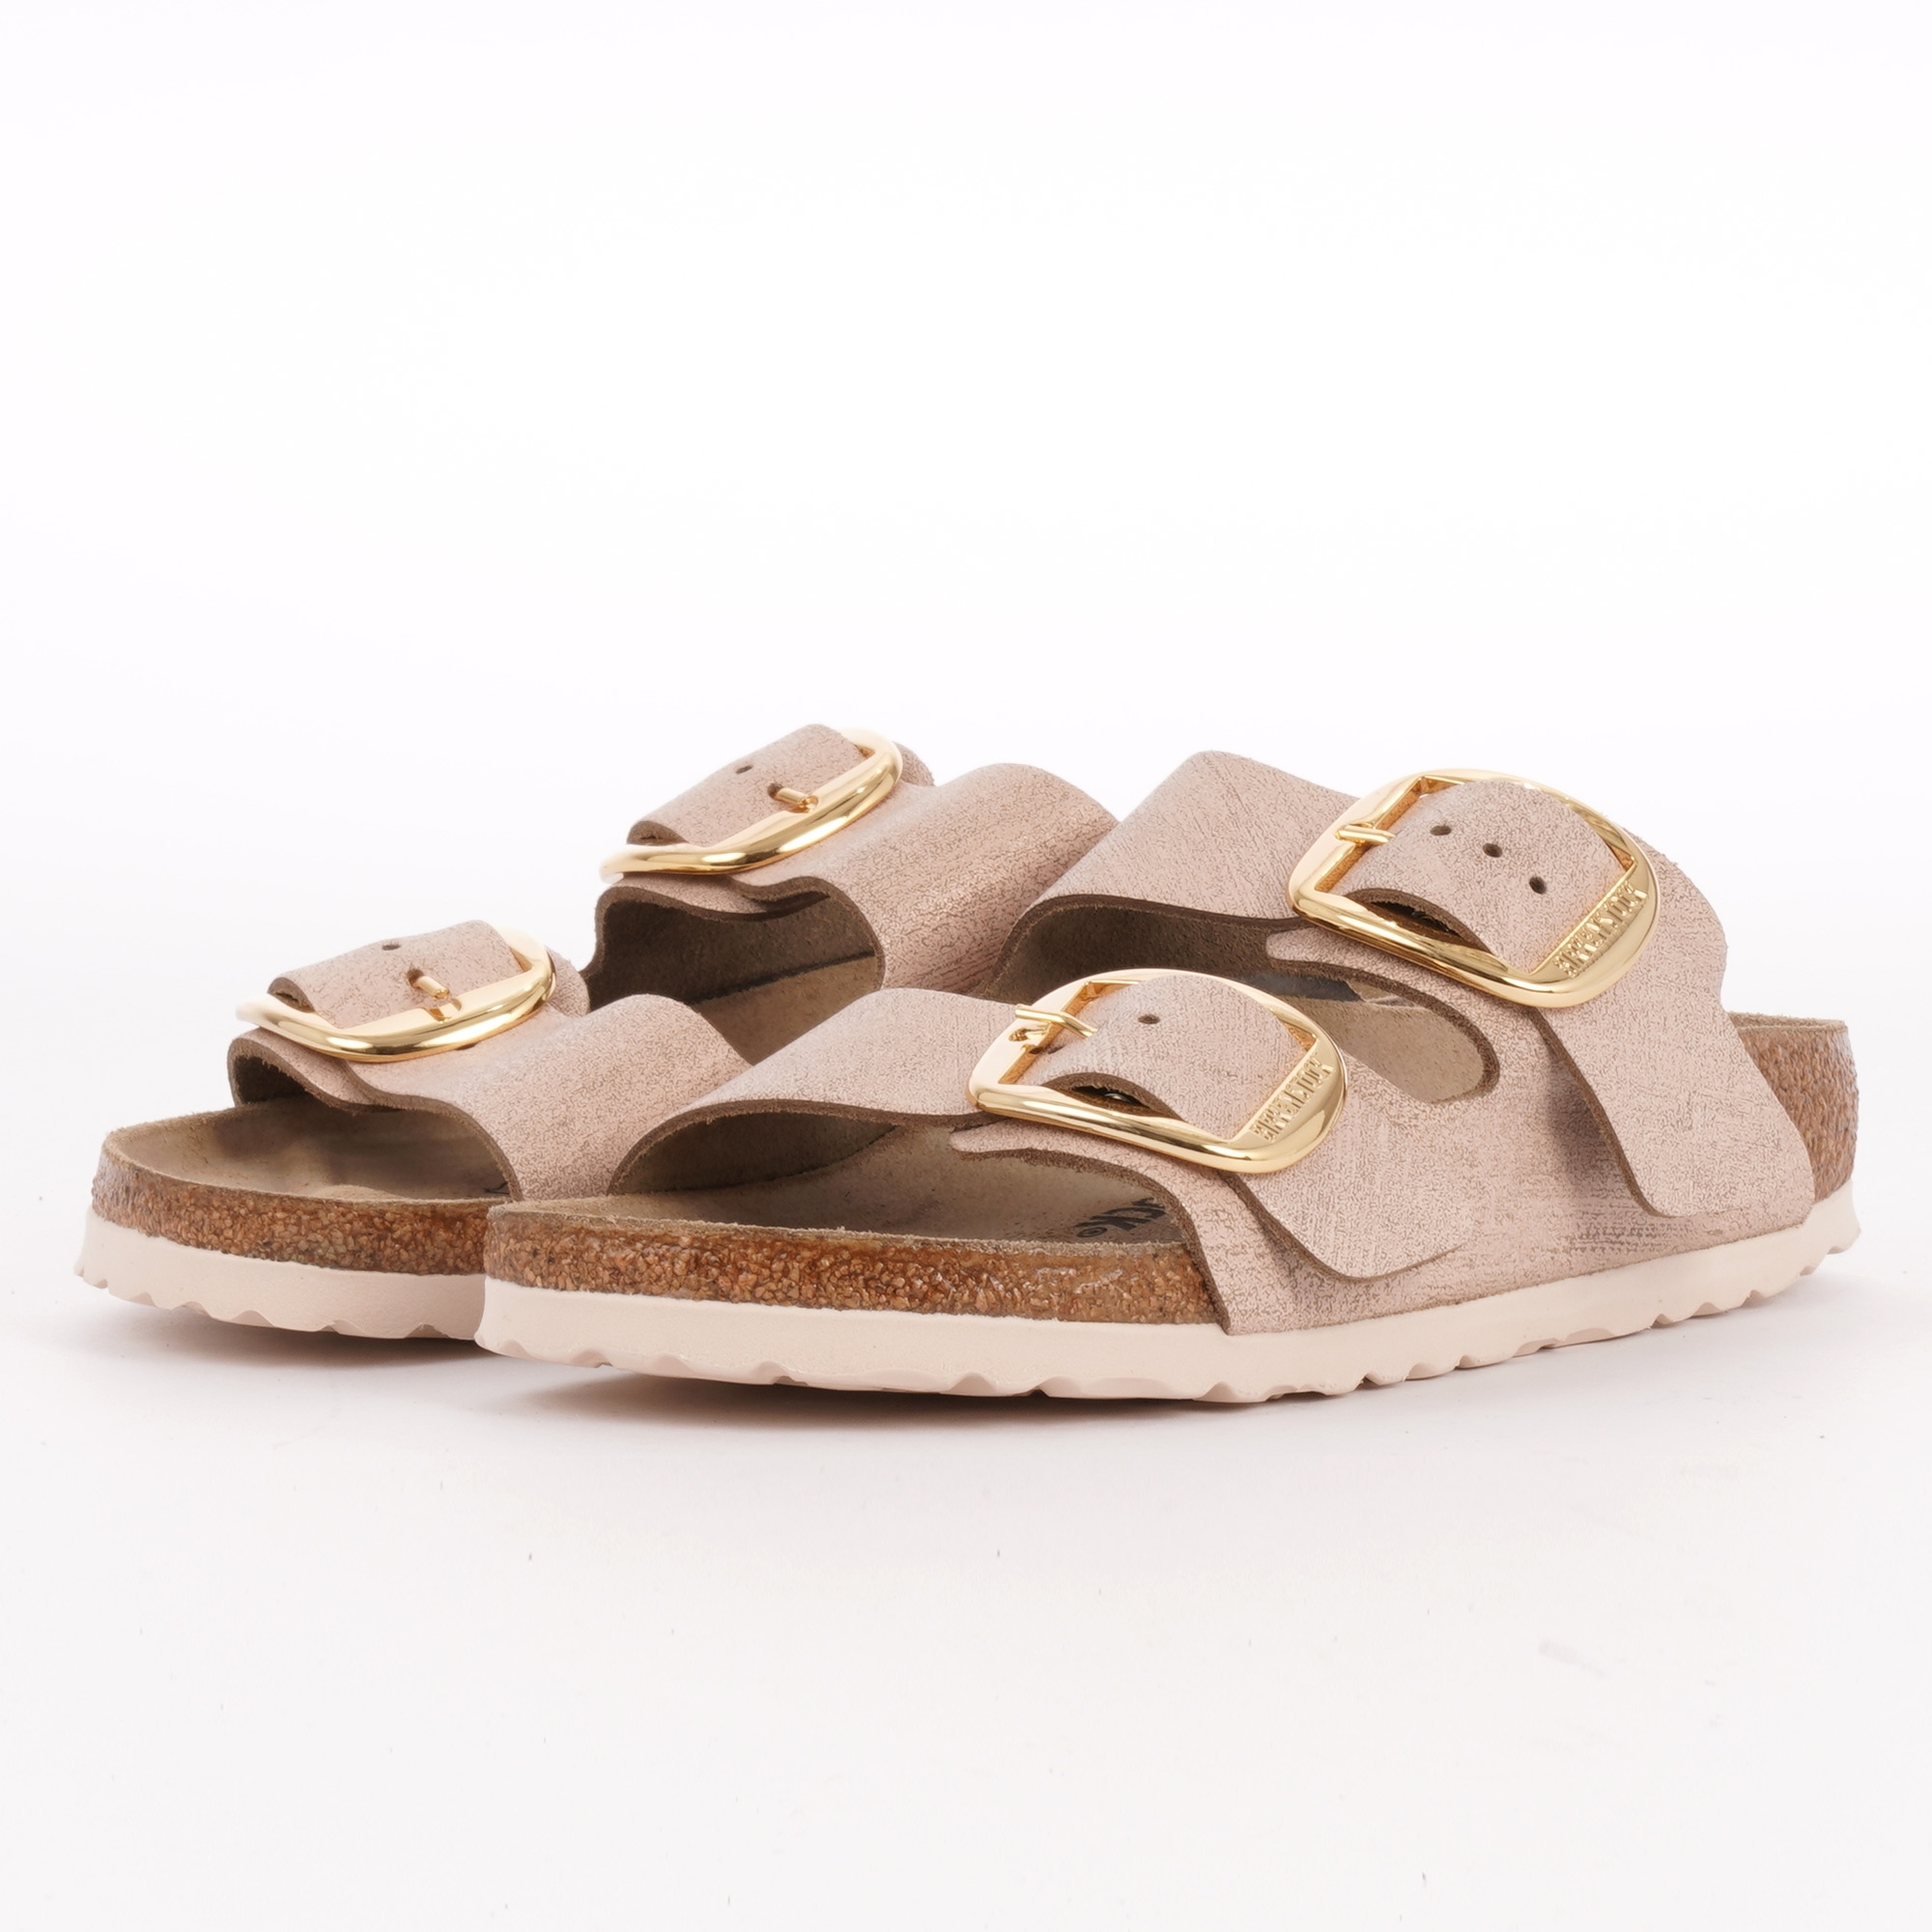 Arizona Big Buckle Sandals - Washed Metallic Rose Gold